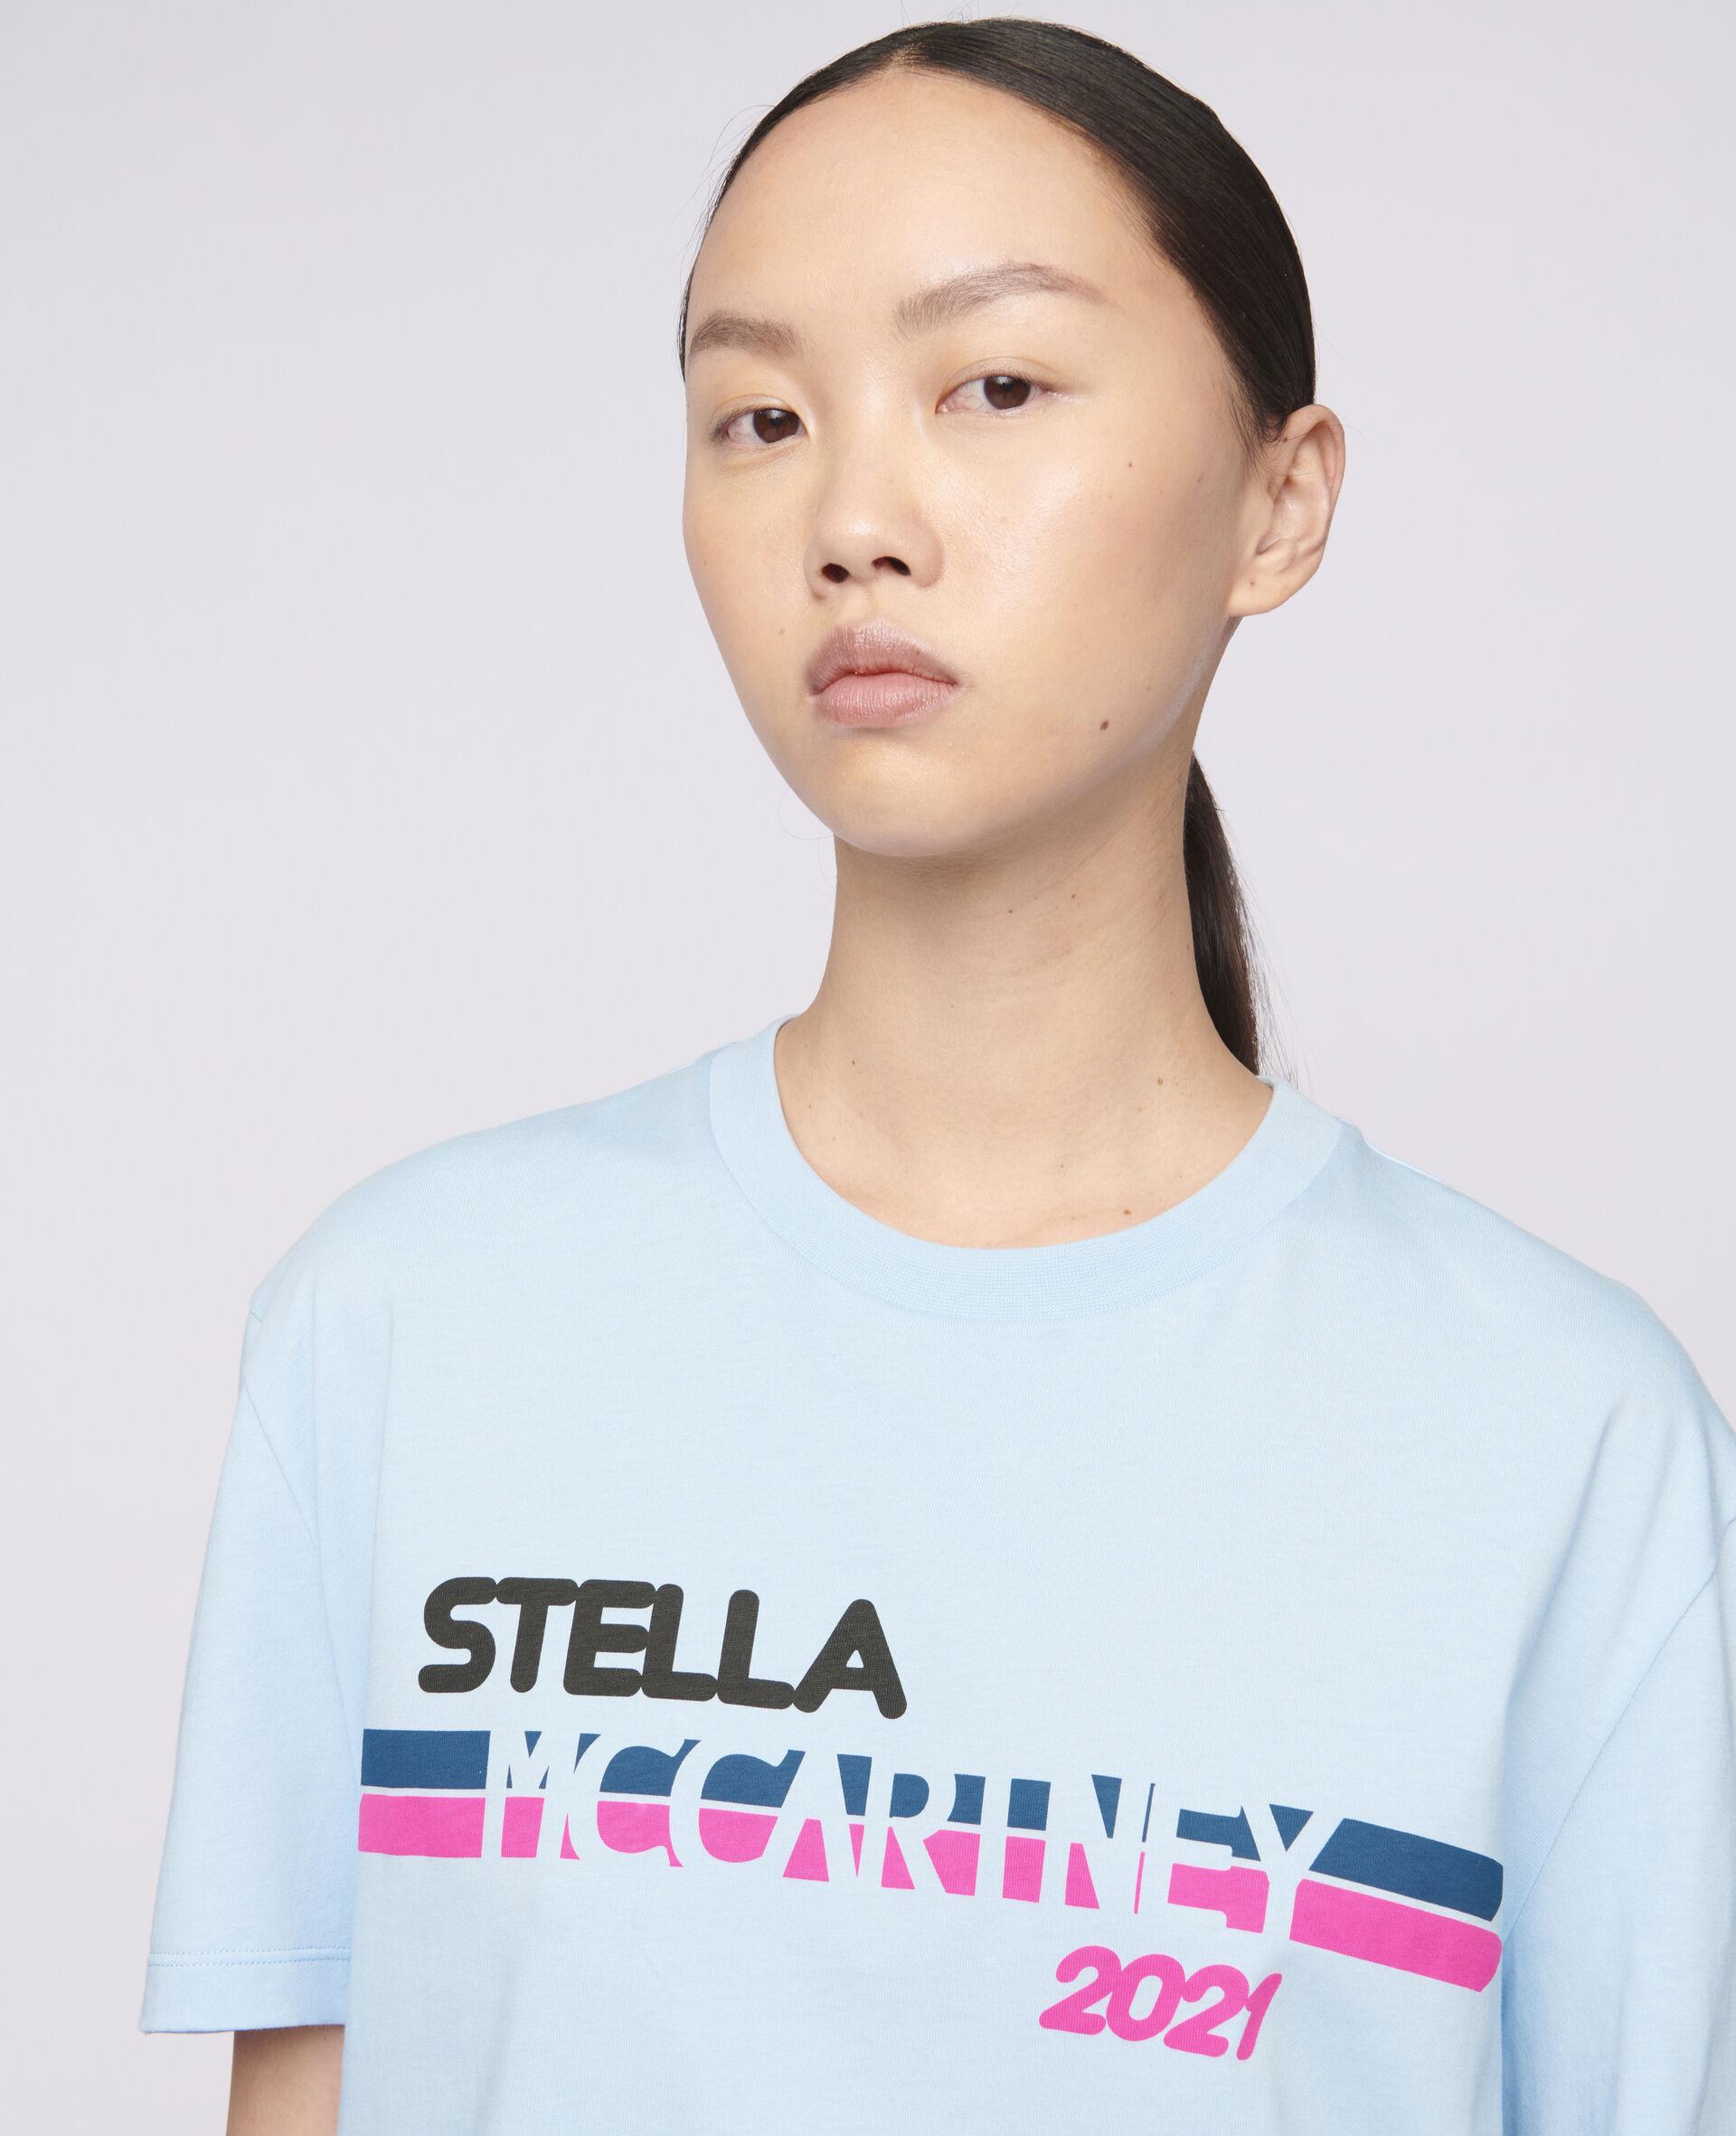 Stella McCartney 2021 徽标 T 恤-蓝色-large image number 3